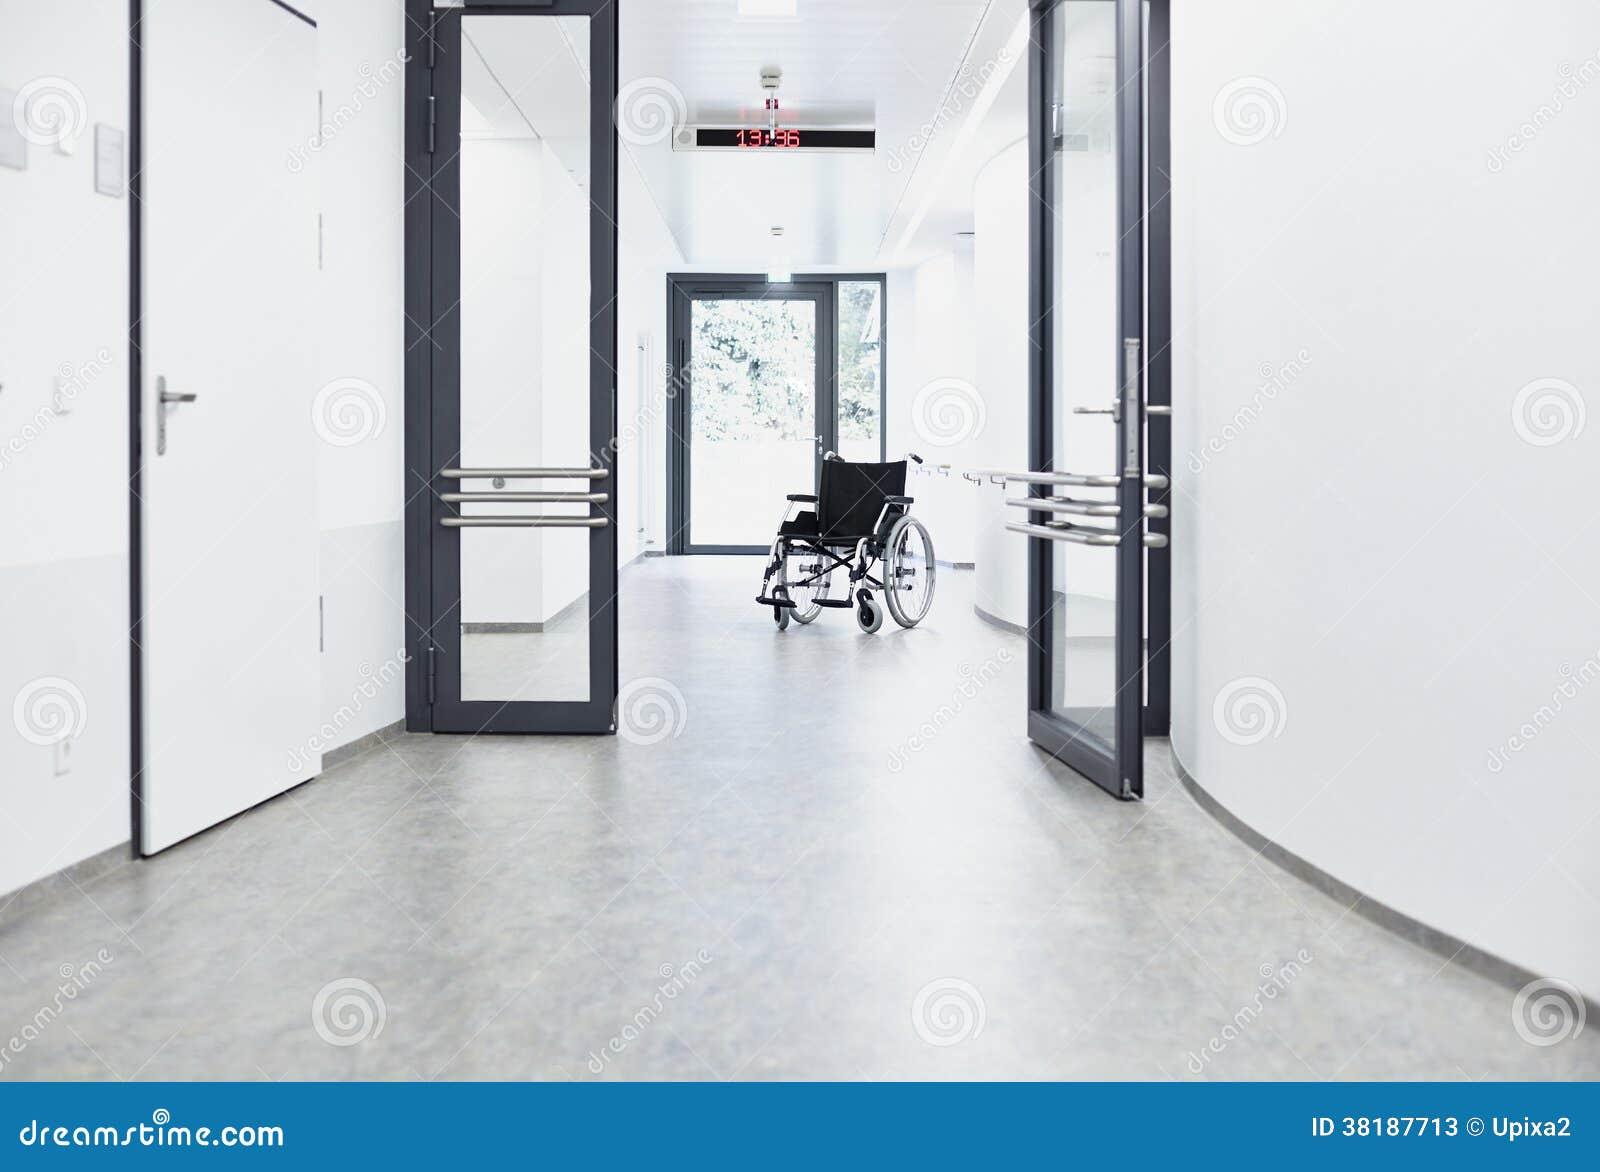 Ada Corridor Images Reverse Search